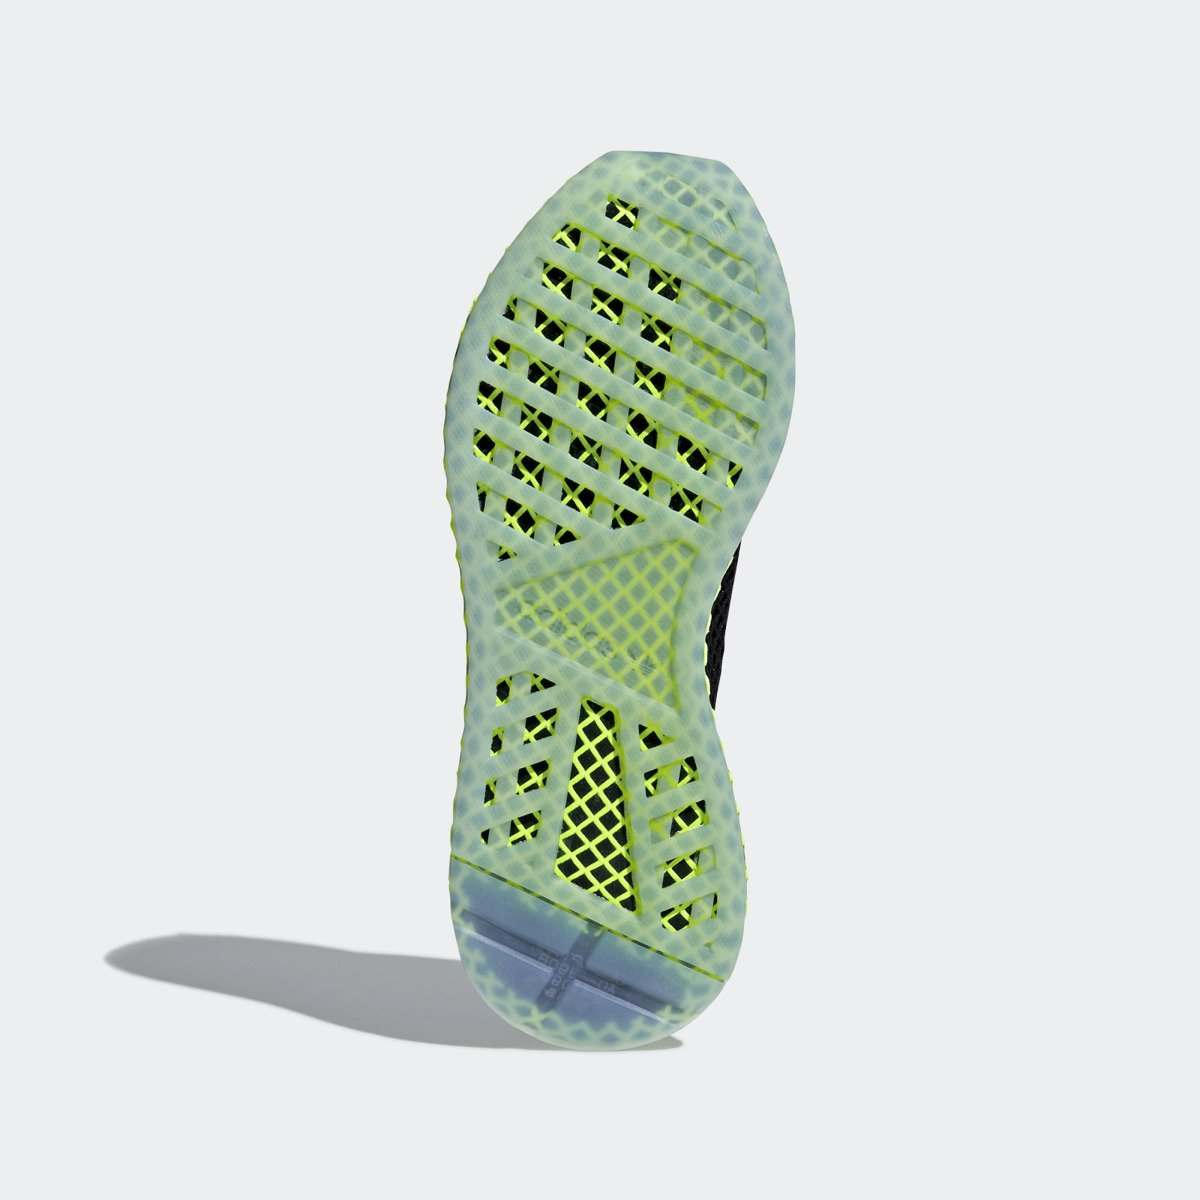 on sale 800c6 cd40d ... Adidas Deerupt Runner Shoes - B41755